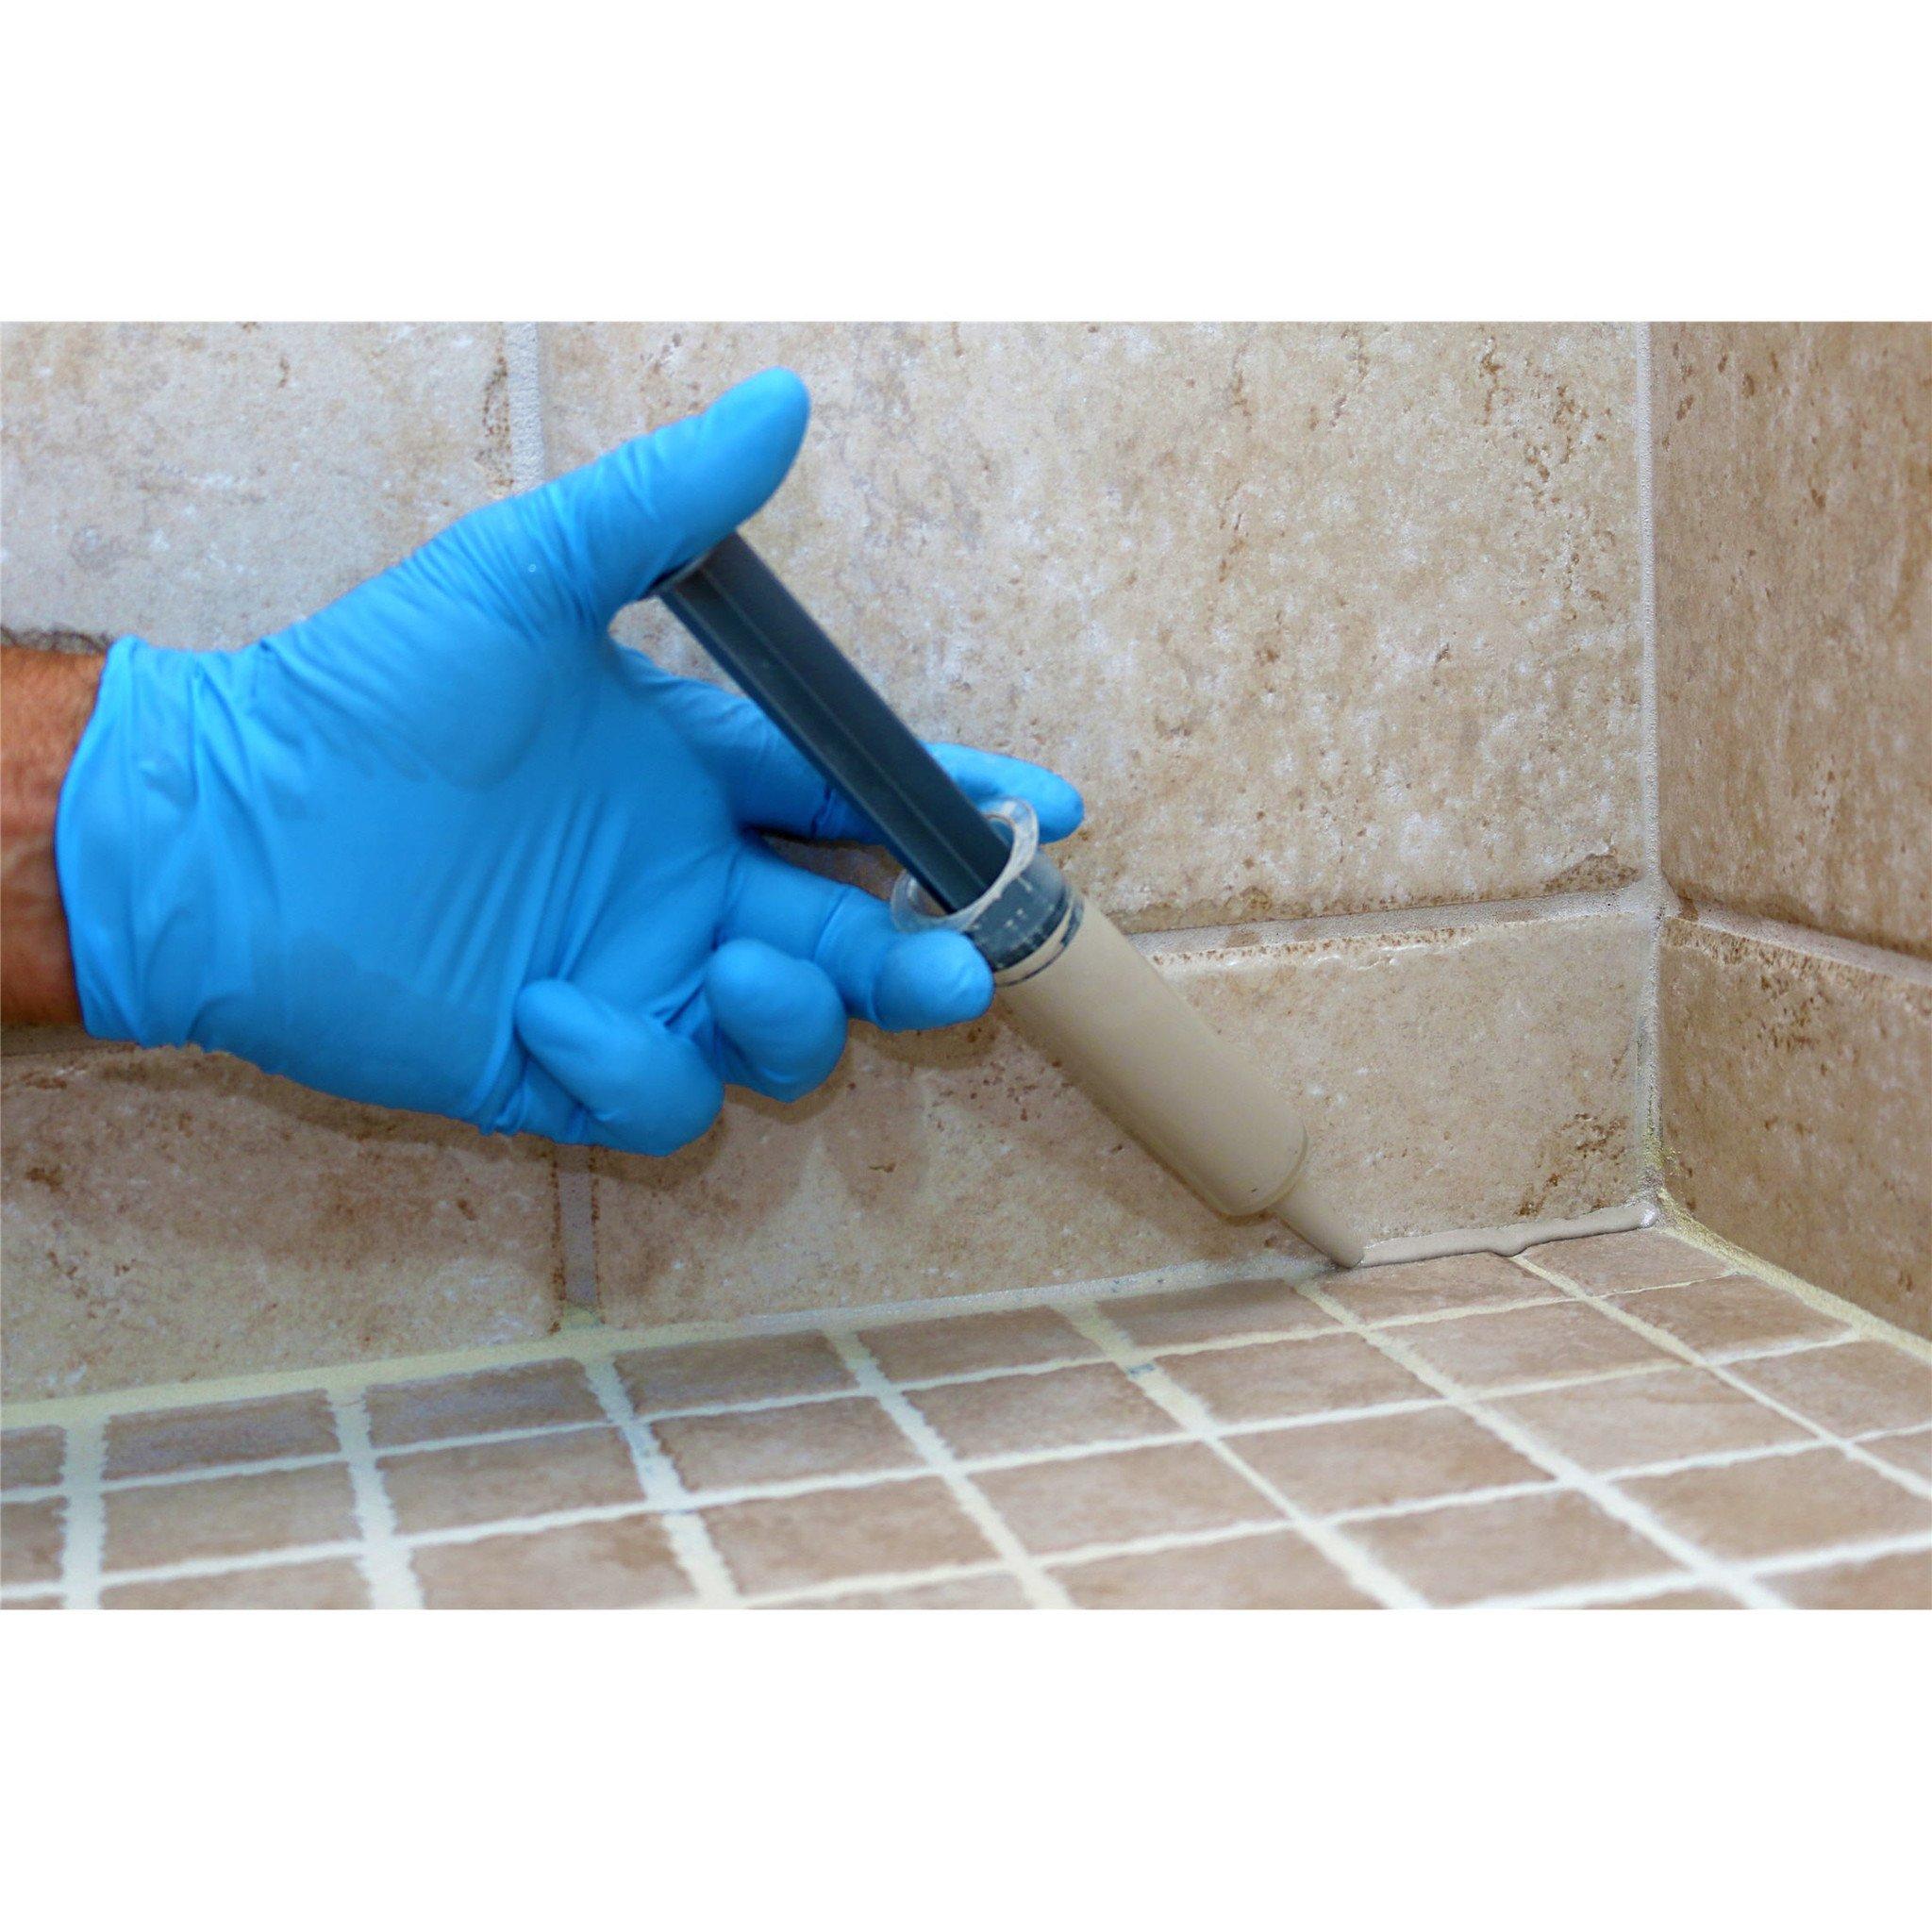 Ceramic tile pro super grout additive ultimate tub and shower ceramic tile pro super grout additive ultimate tub and shower sealant doublecrazyfo Gallery